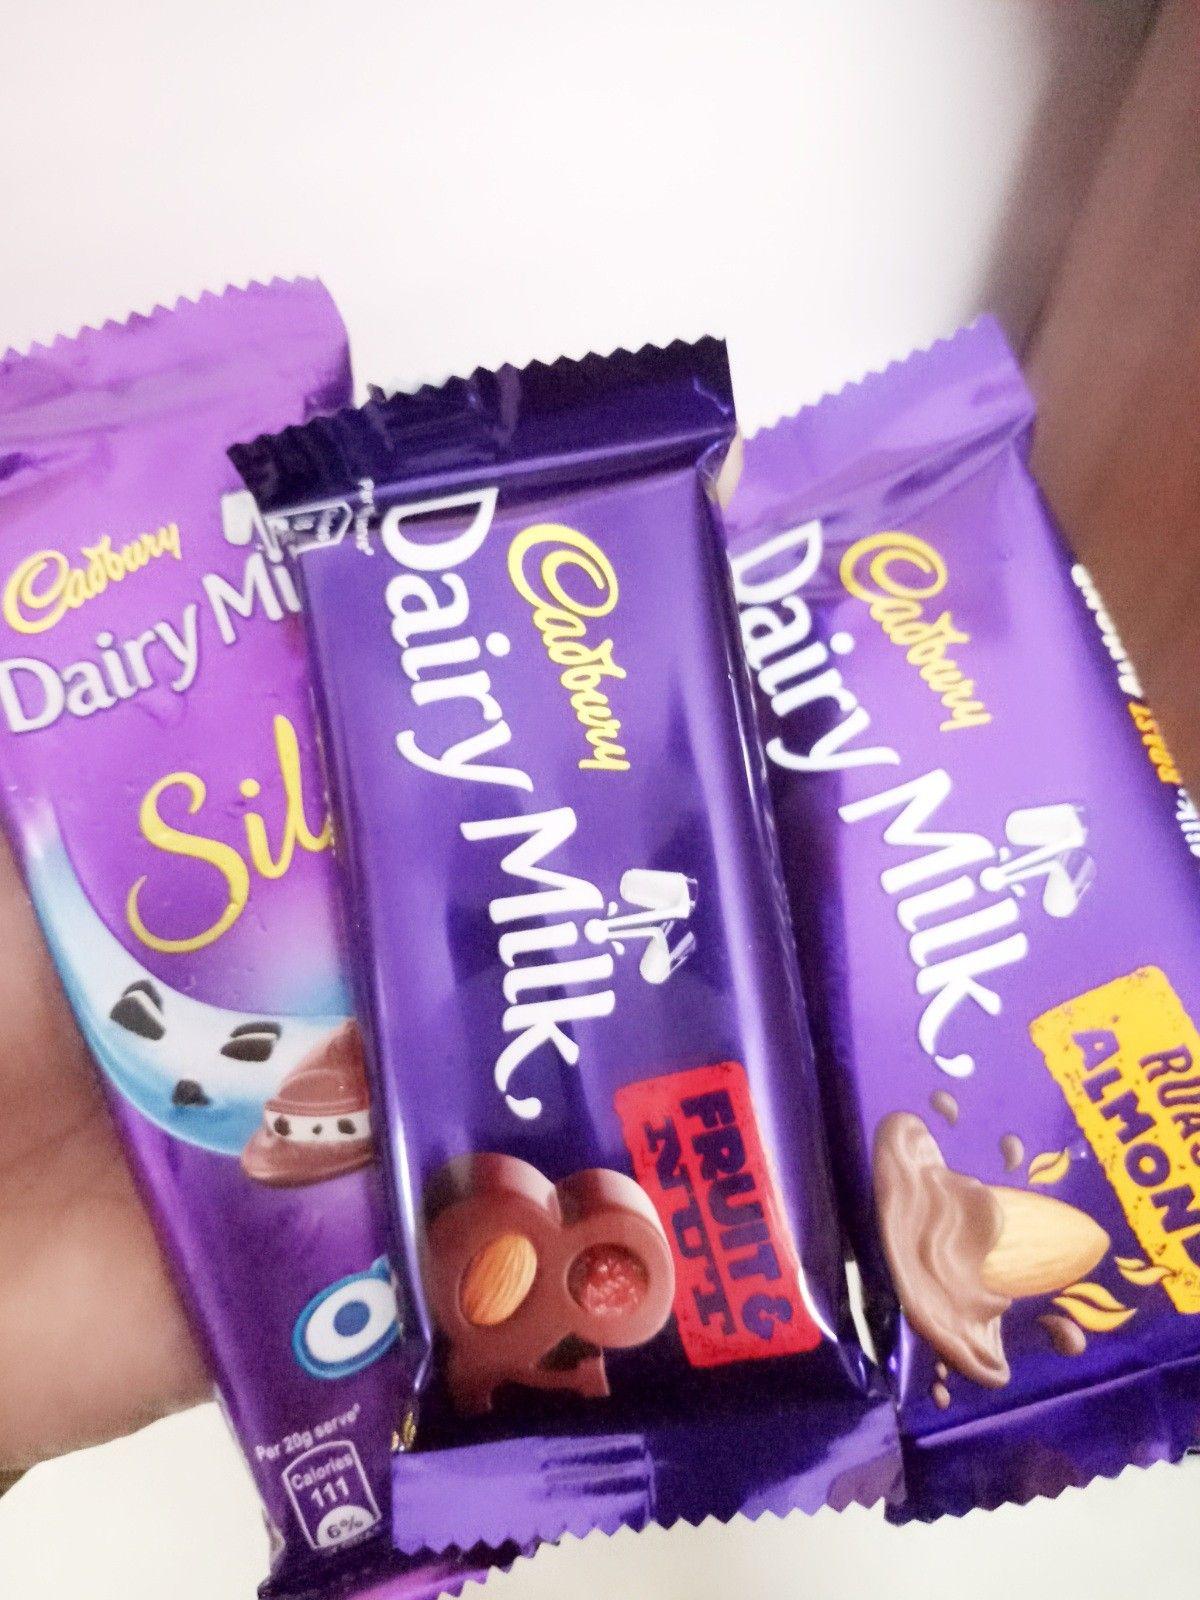 Dairymilk Chocolate Gift Love Dairy Milk Chocolate Dairy Milk Chocolate Images Cadbury Dairy Milk